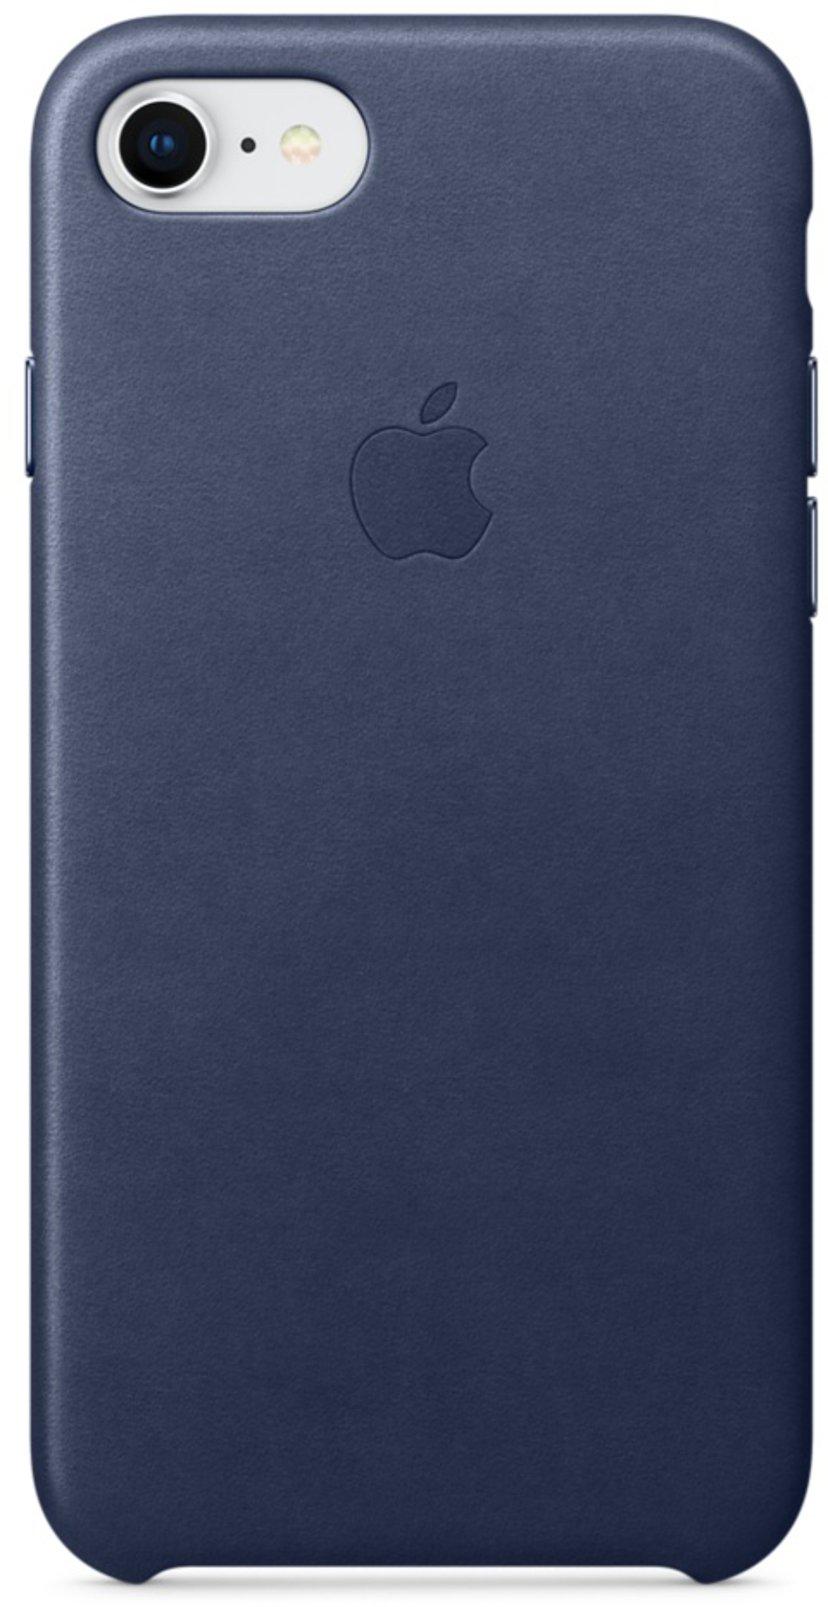 Apple Baksidedeksel for mobiltelefon iPhone 7; iPhone 8 Midnattsblå